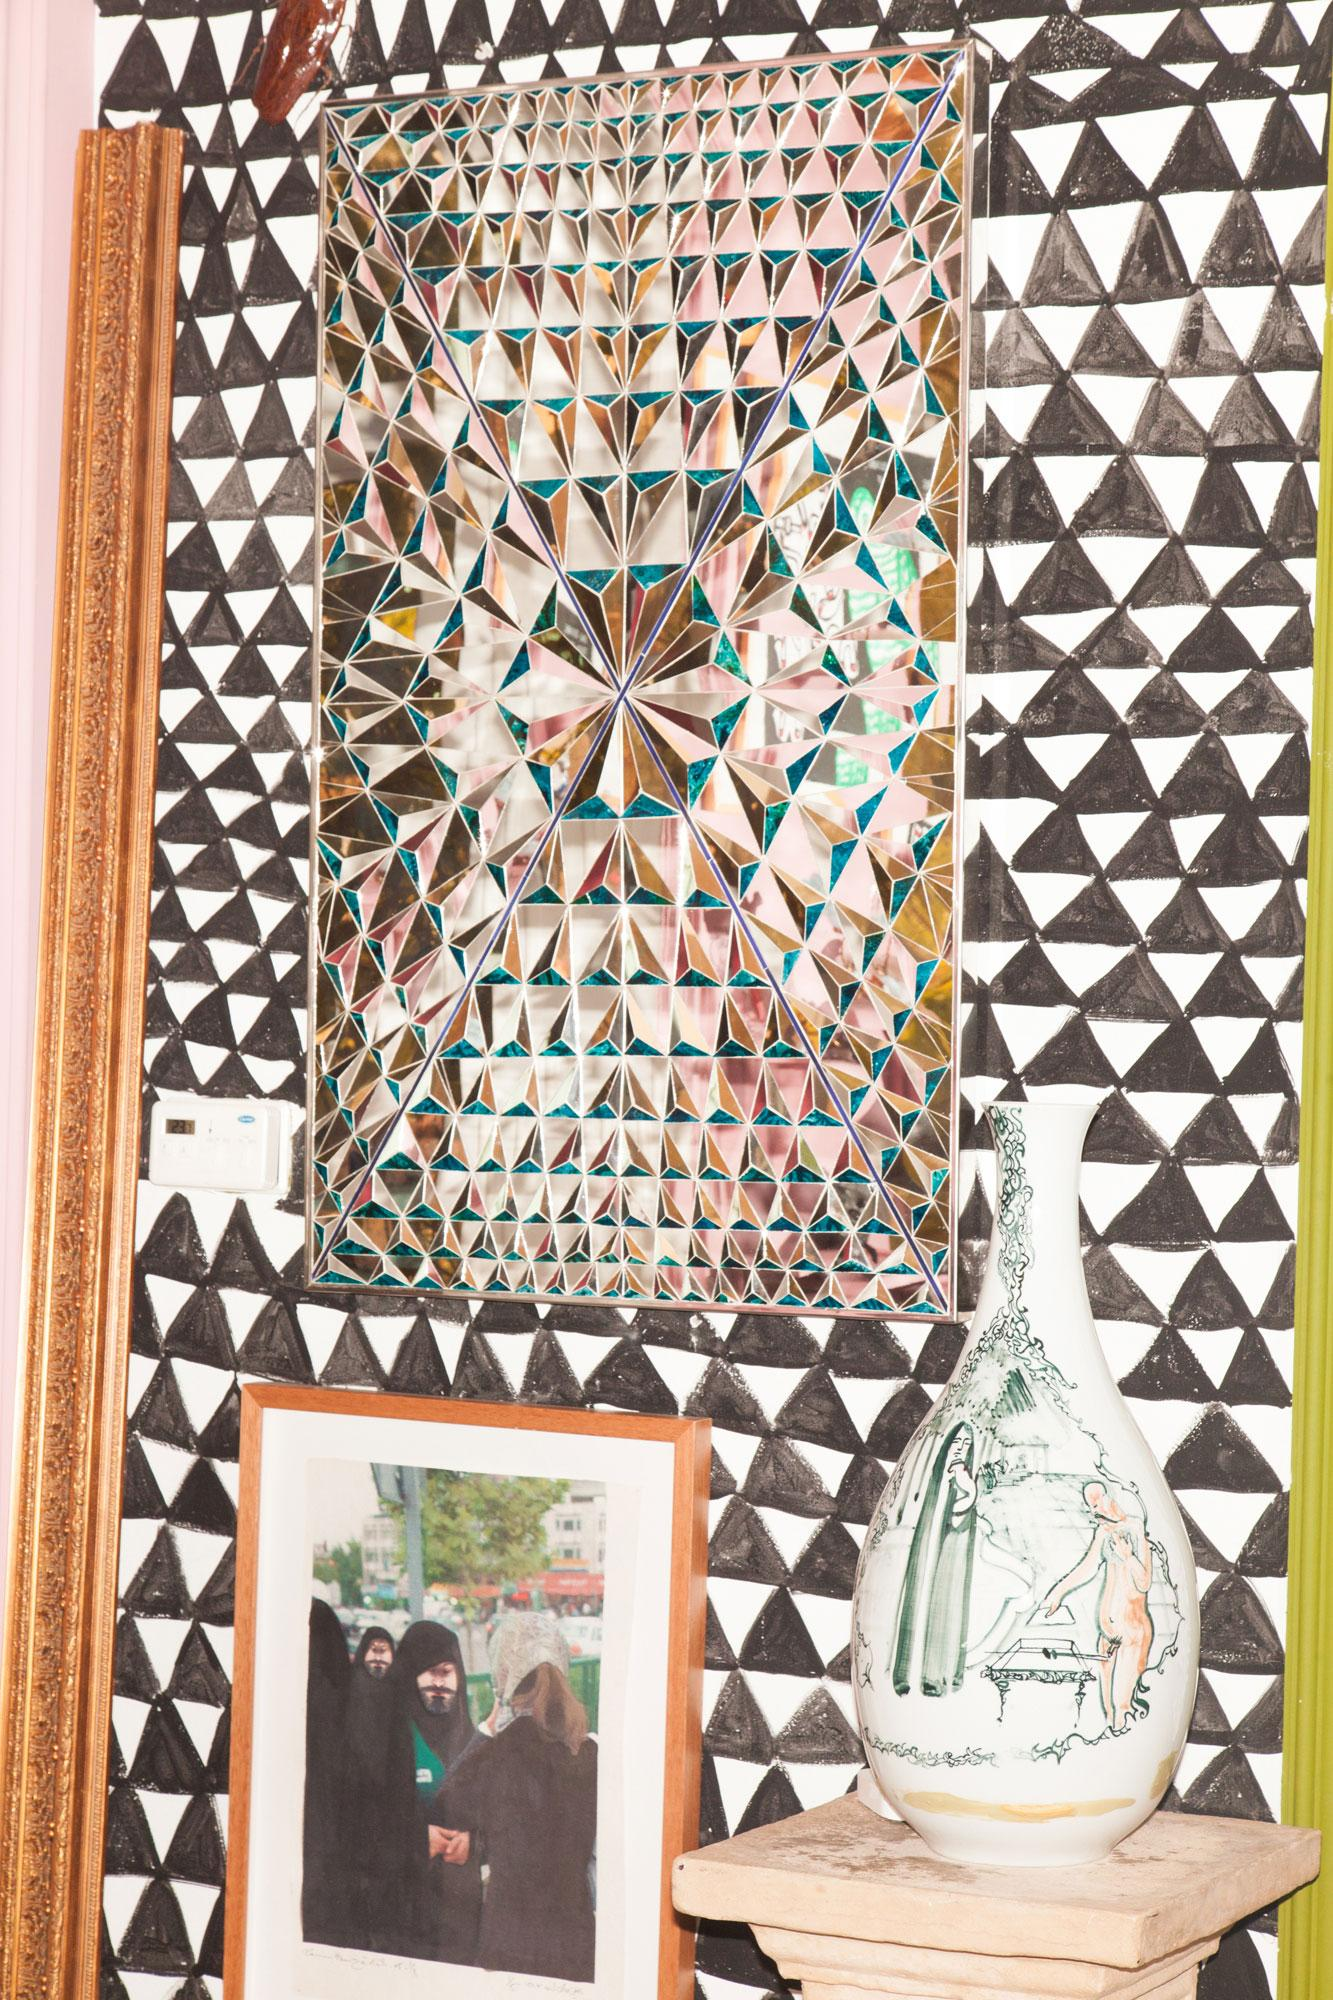 From top: Mirror work by Monir Shahroudy Farmanfarmaian Collage by Ramin Haerizadeh Meissen Porcelain vase by Rokni Haerizadeh